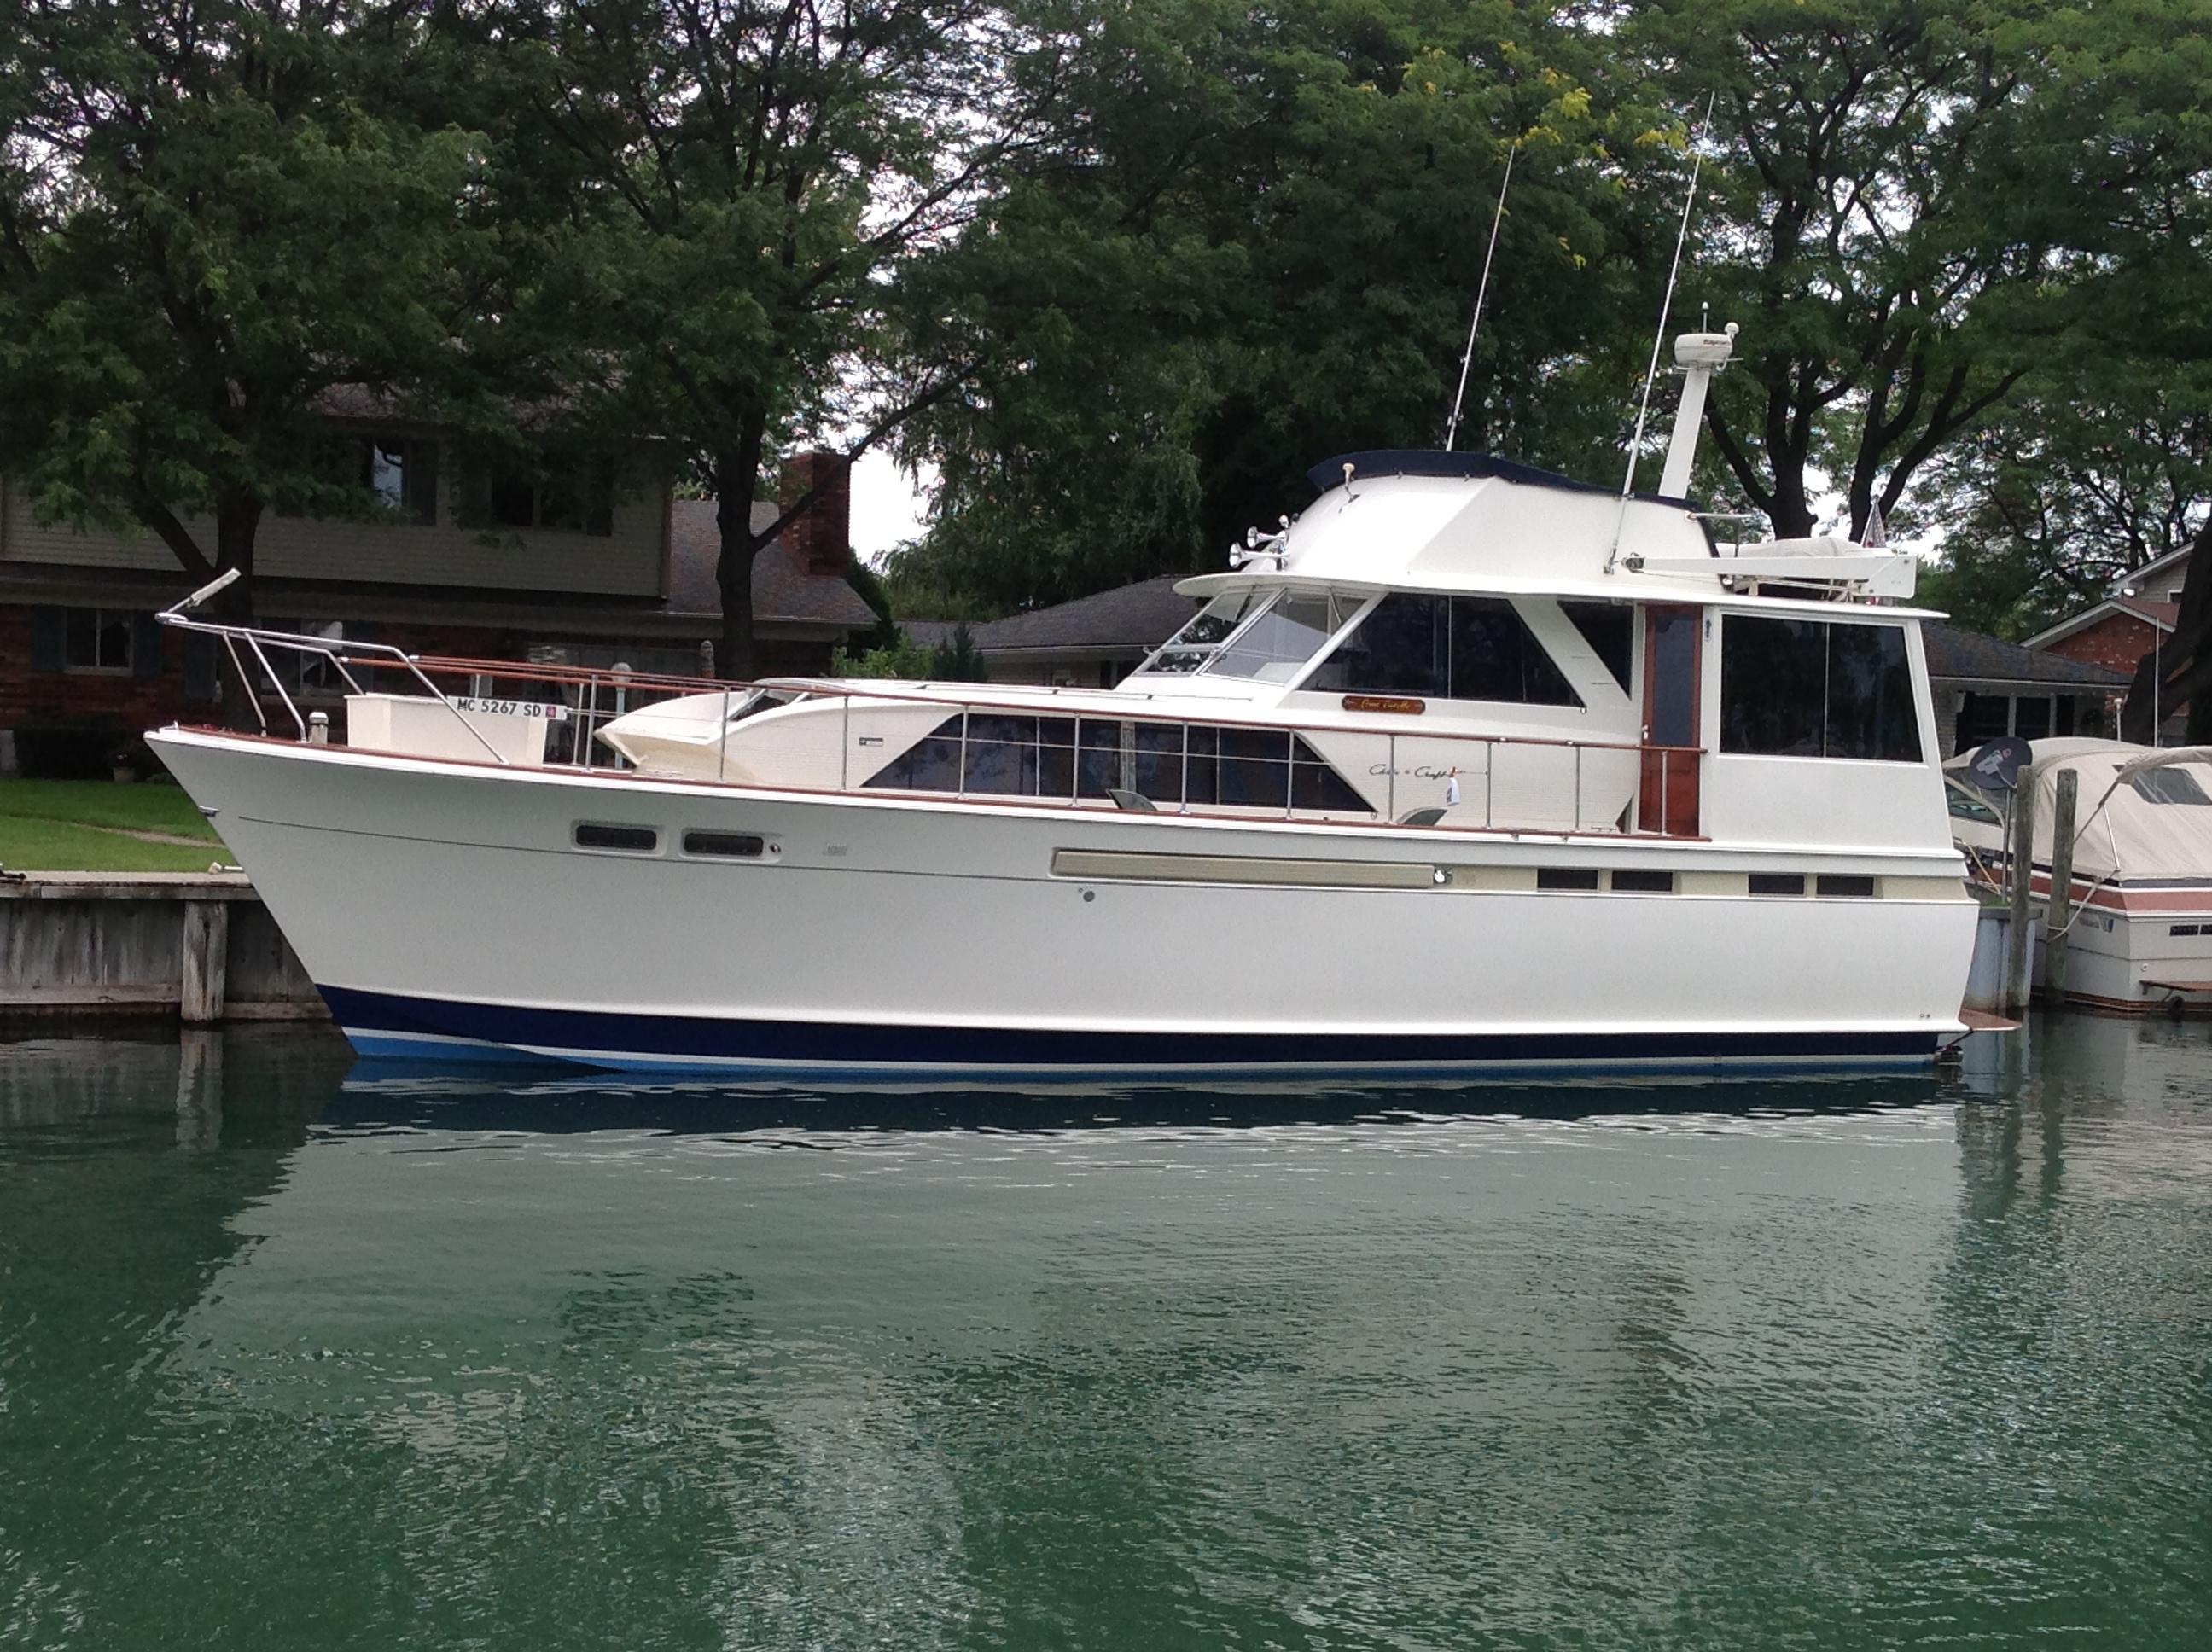 1968 Chris Craft Commander Flush Deck Power Boat For Sale Wwwyachtworldcom